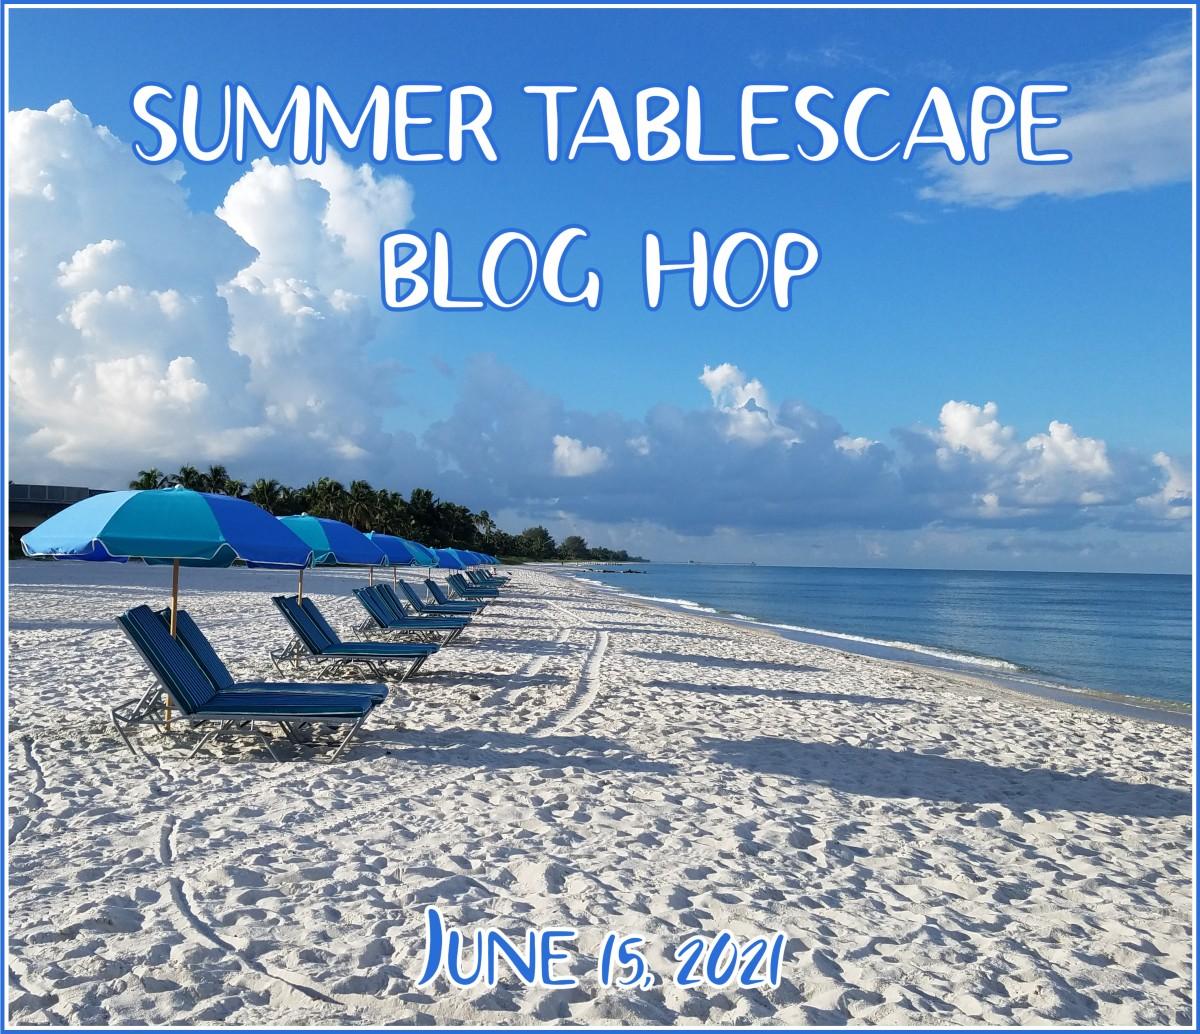 Summer Tablescape Blog Hop